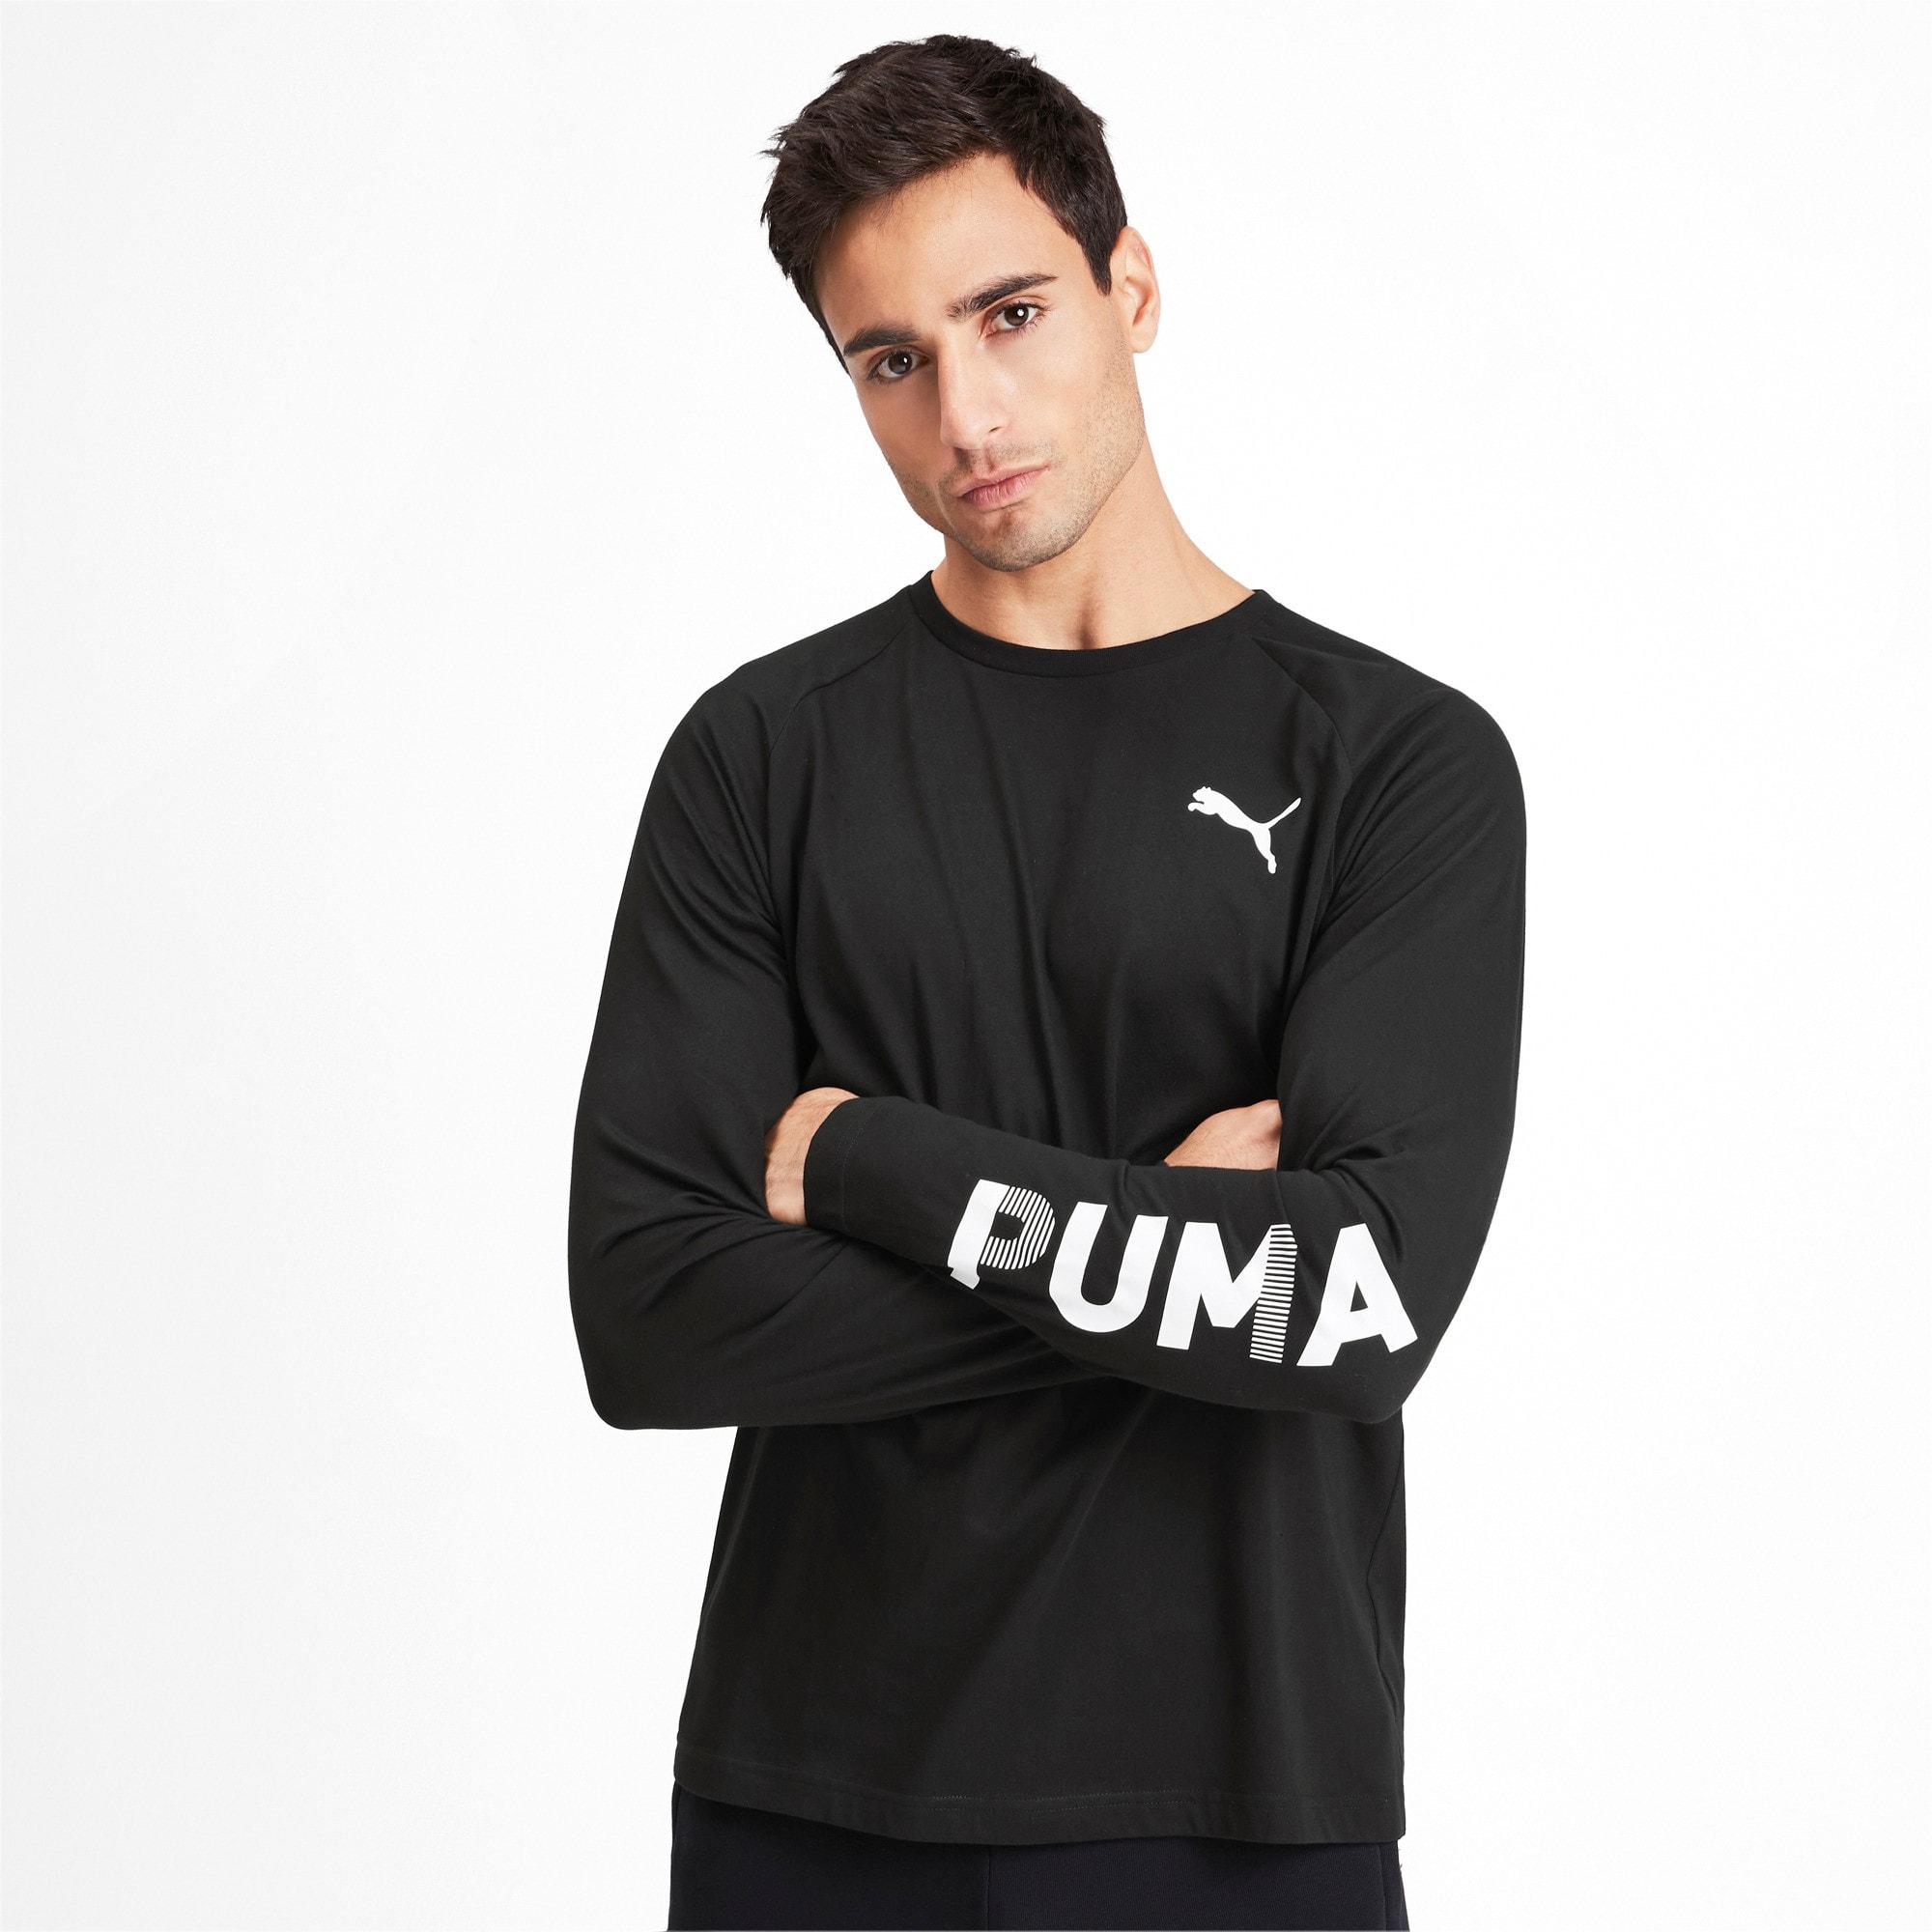 Thumbnail 2 of Modern Sports Men's Long Sleeve Tee, Puma Black, medium